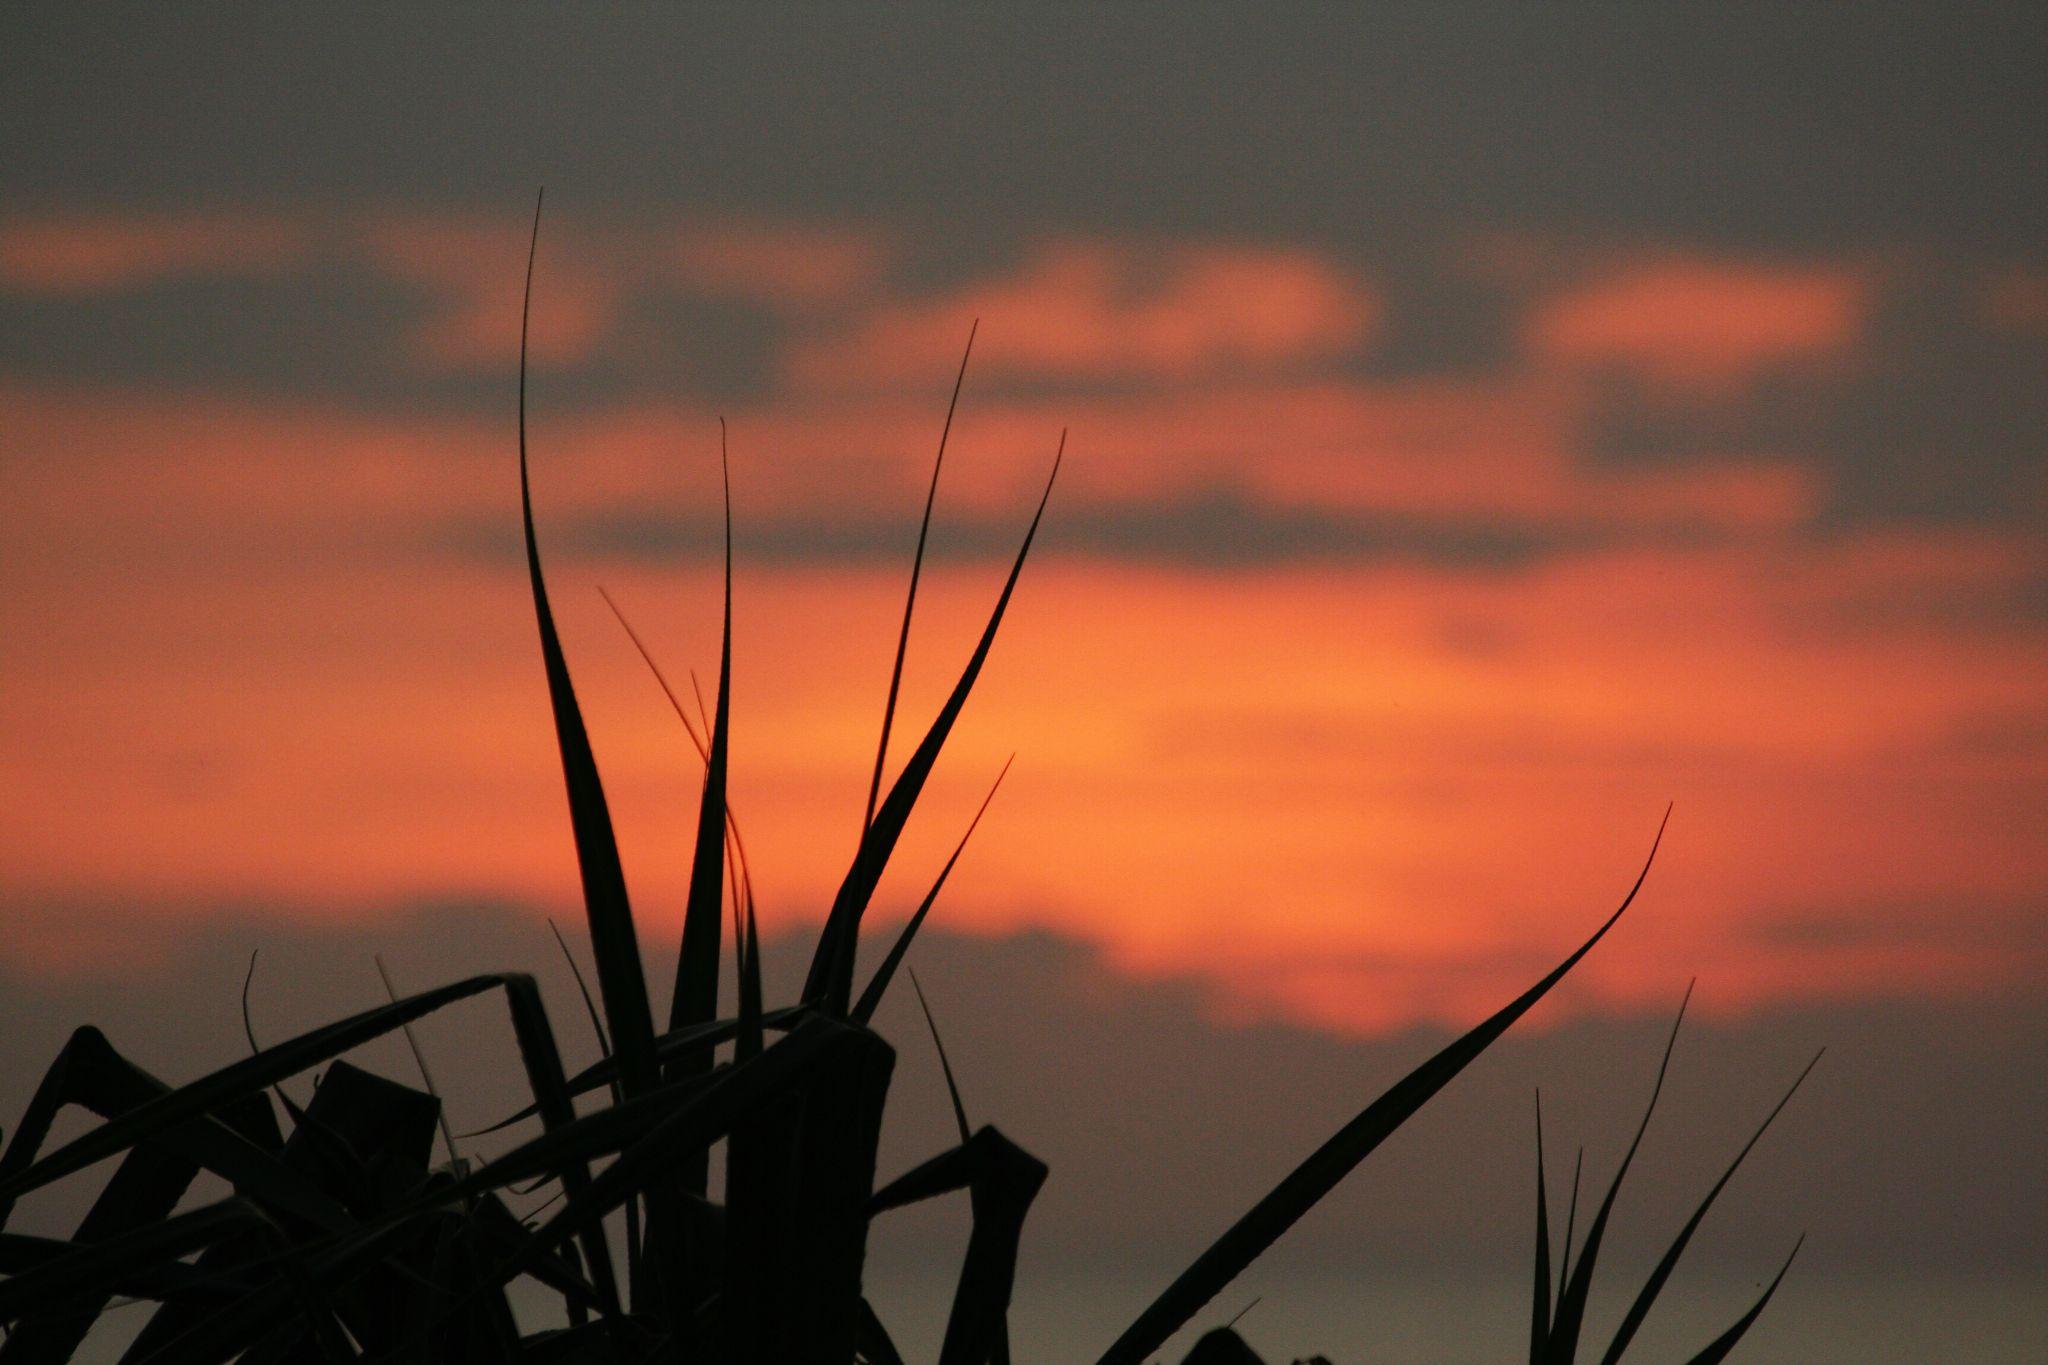 Dazzling Sun by nader eskandari